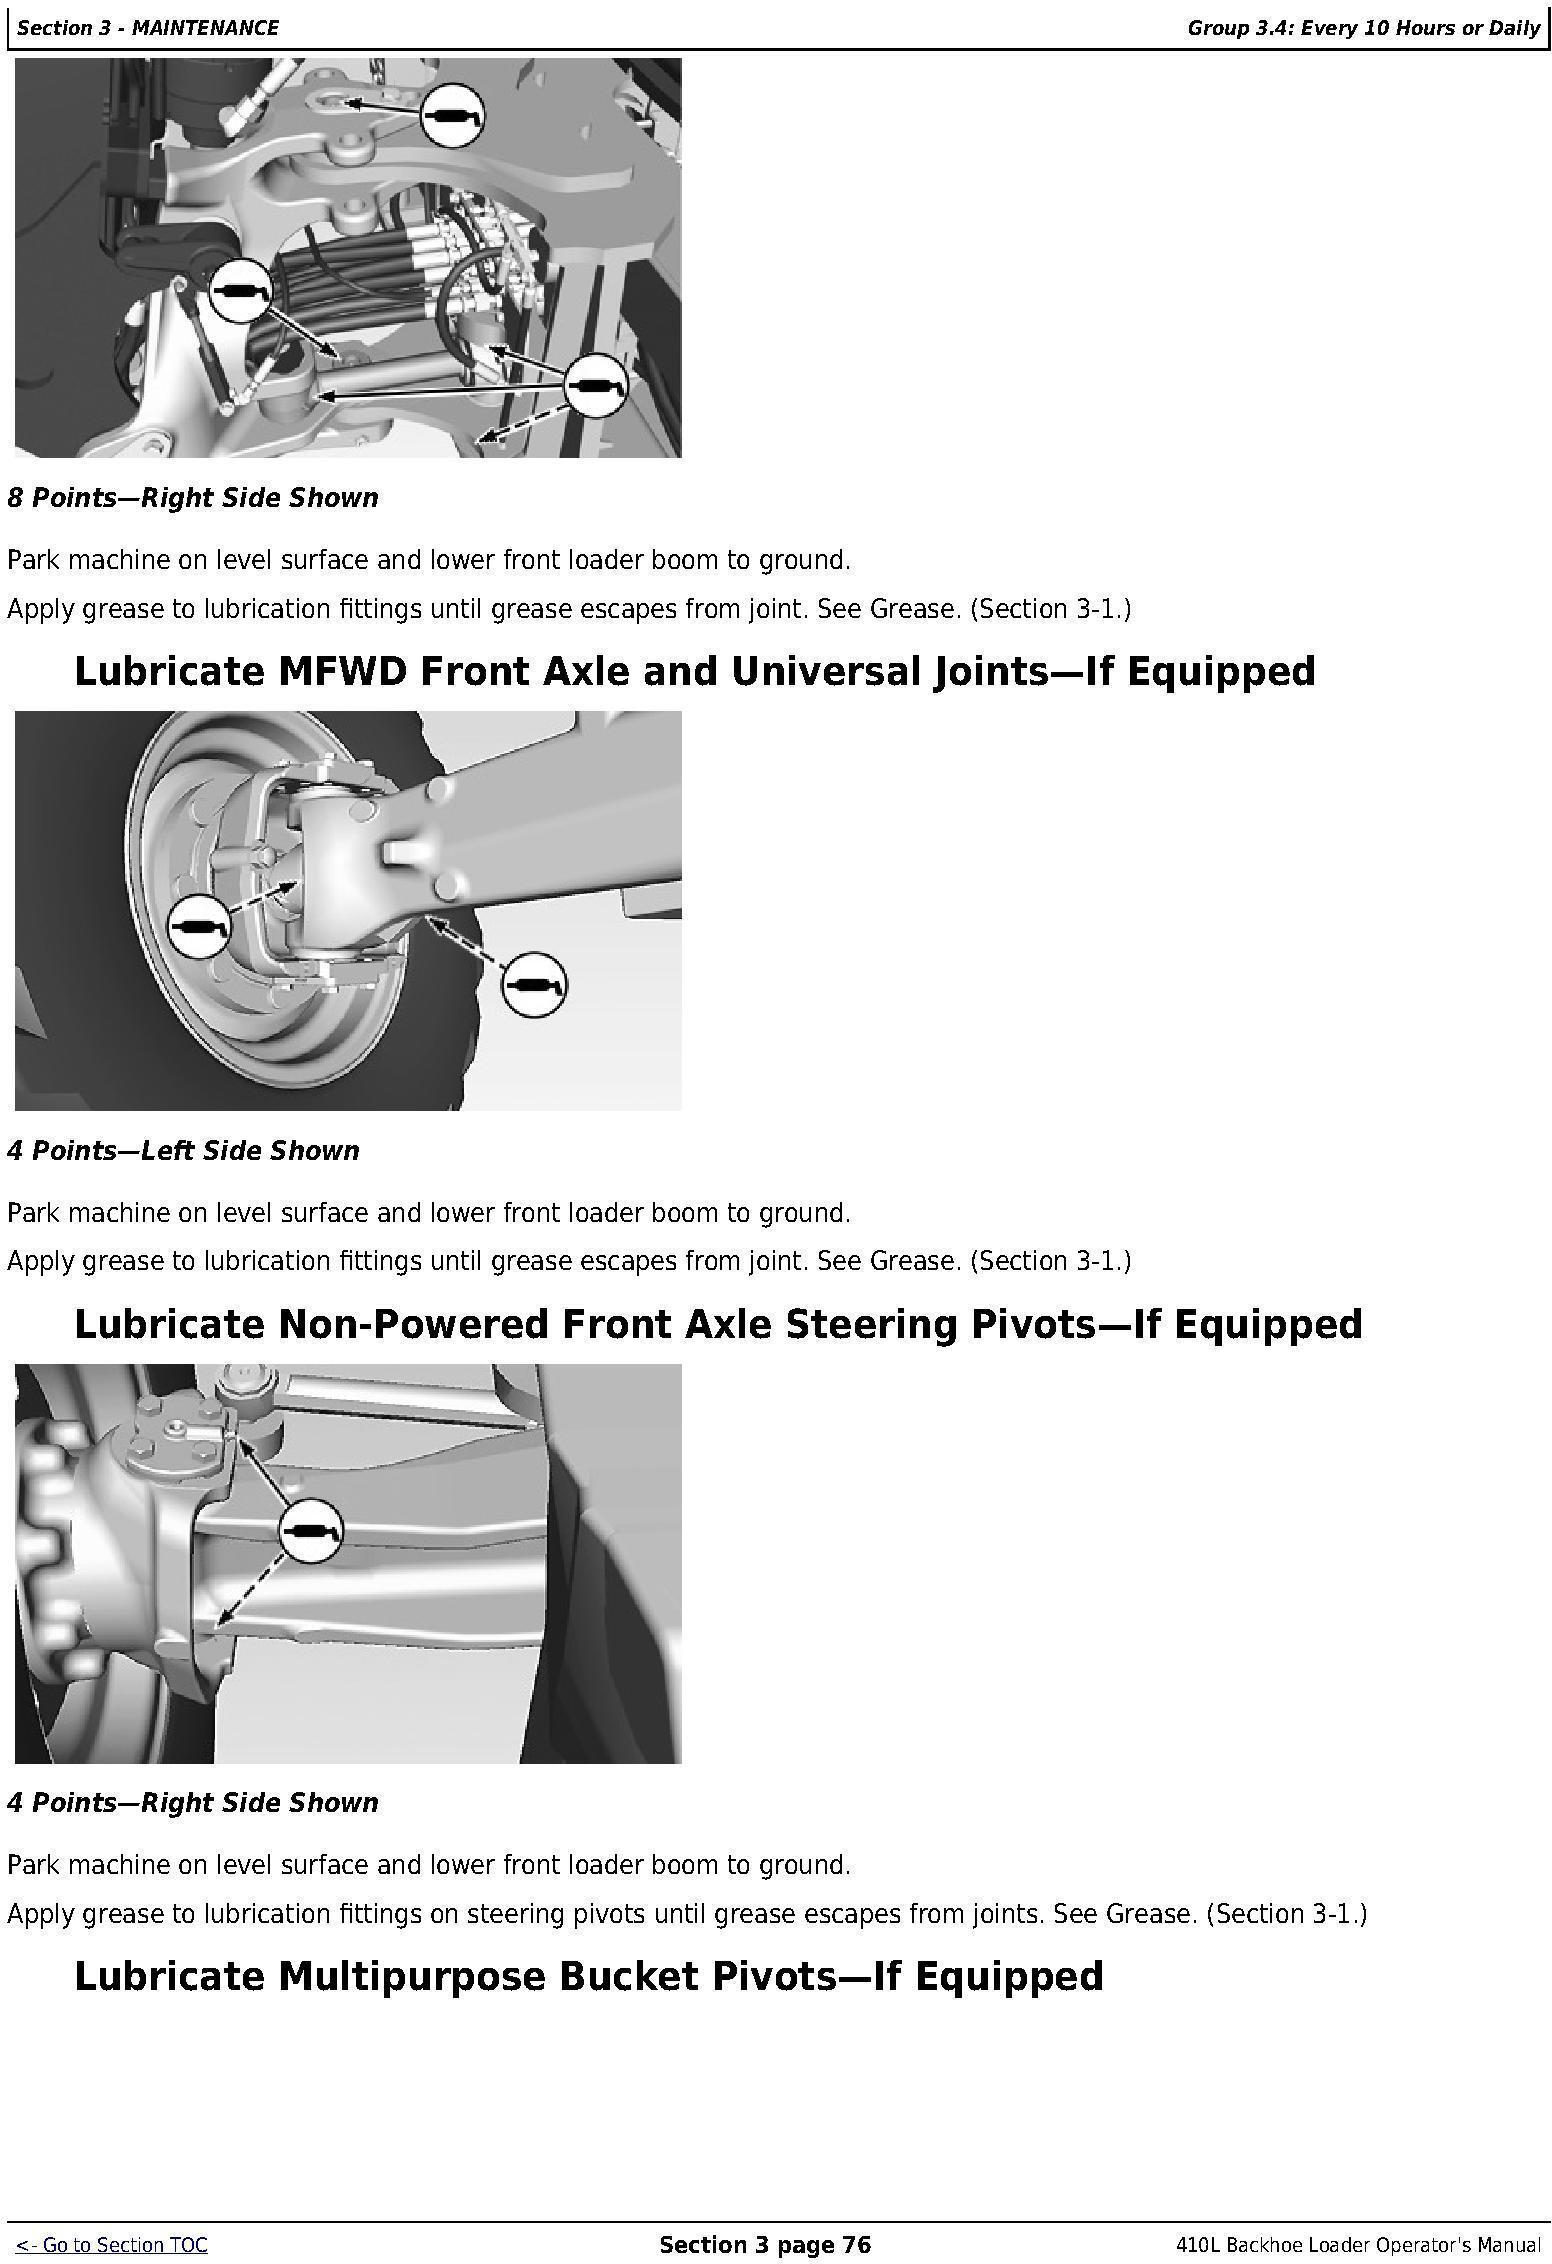 OMT357556X19 - JD John Deere 410L Backhoe Loader Operators Manual (sn. C273920-; D273920-) - 3